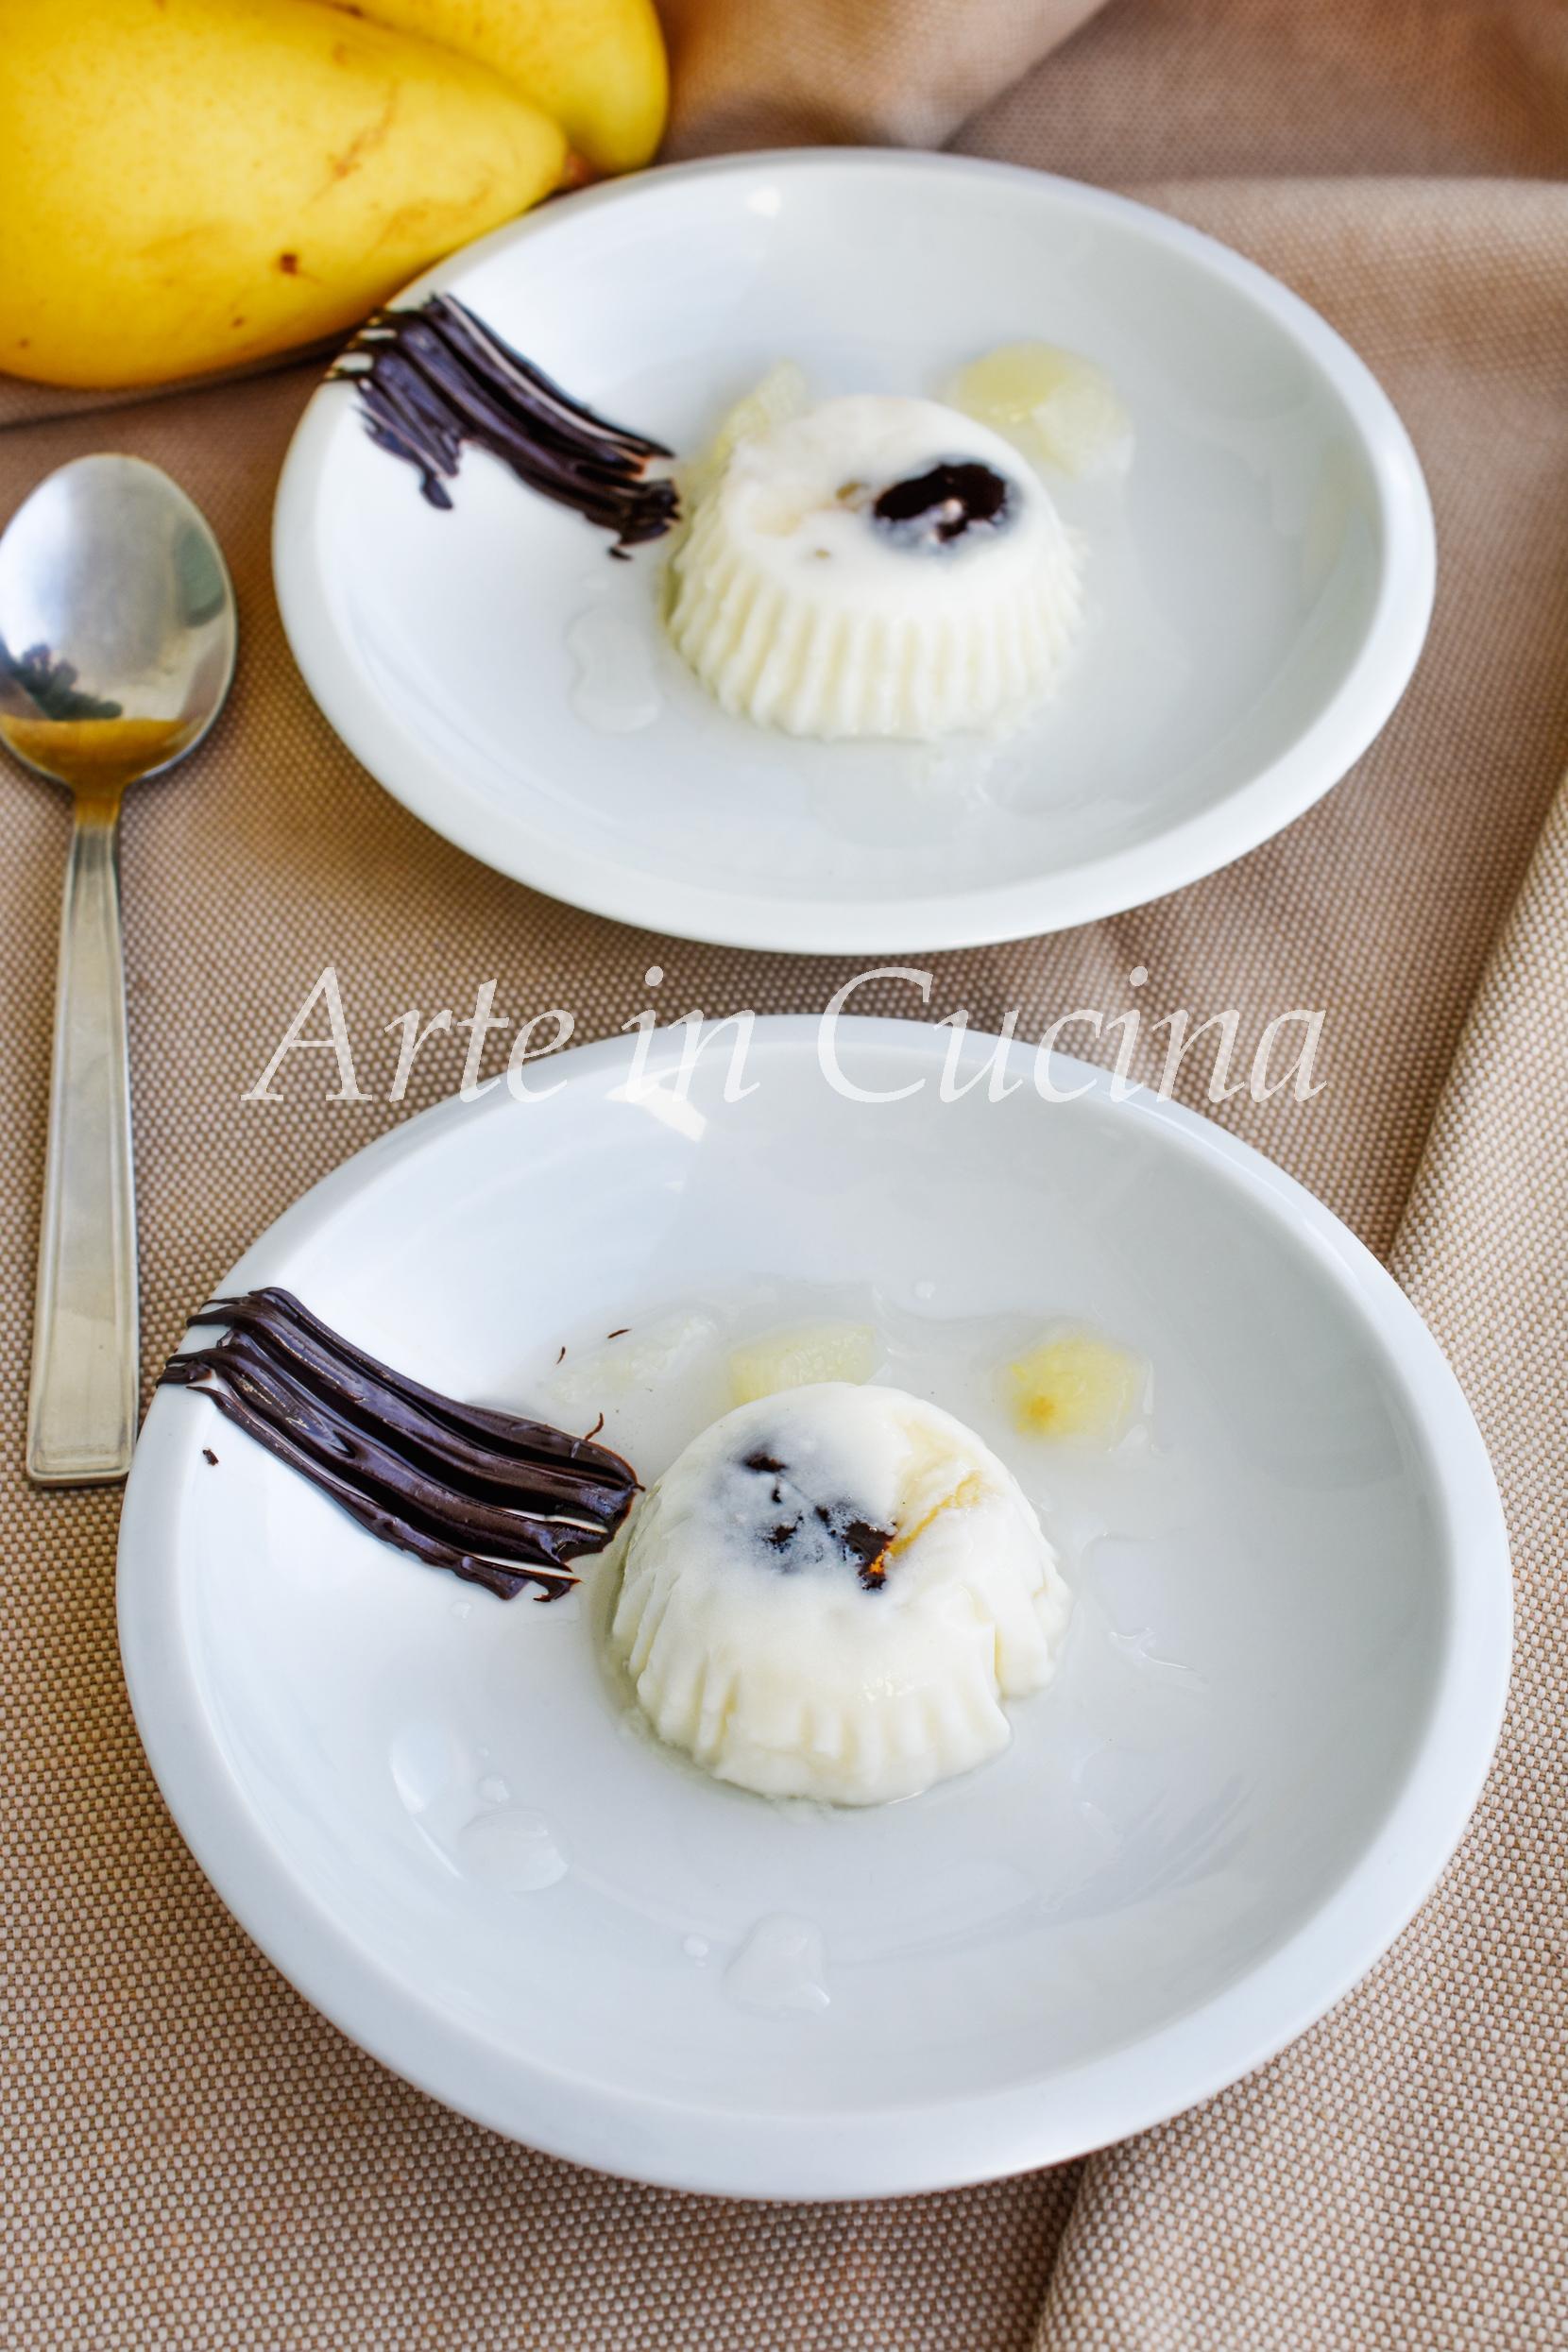 Panna cotta pere e cioccolato facile e goloso dolce al cucchiaio vickyart arte in cucina